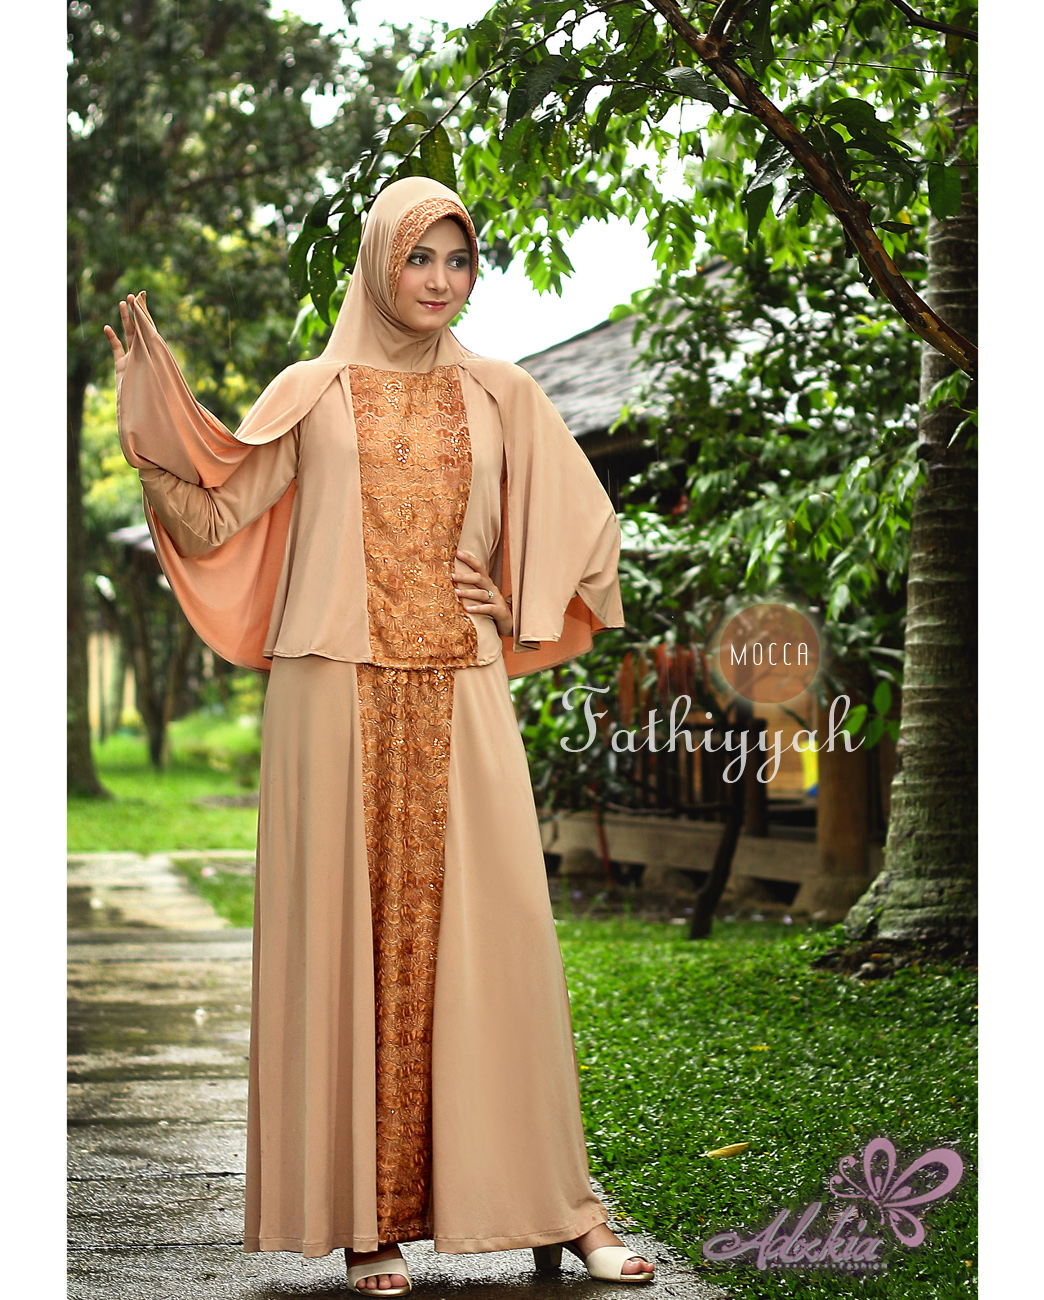 Baju Muslim Wanita Modern Fathiyyah by Adzkia Mocca